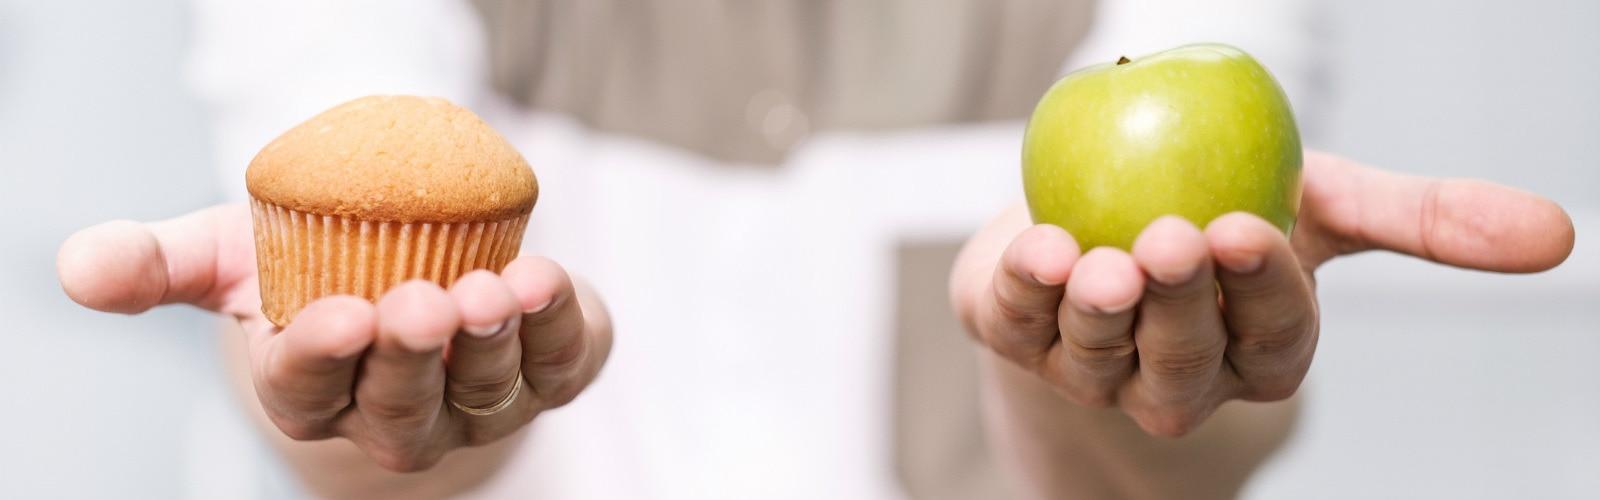 Falsos mitos alimenticios